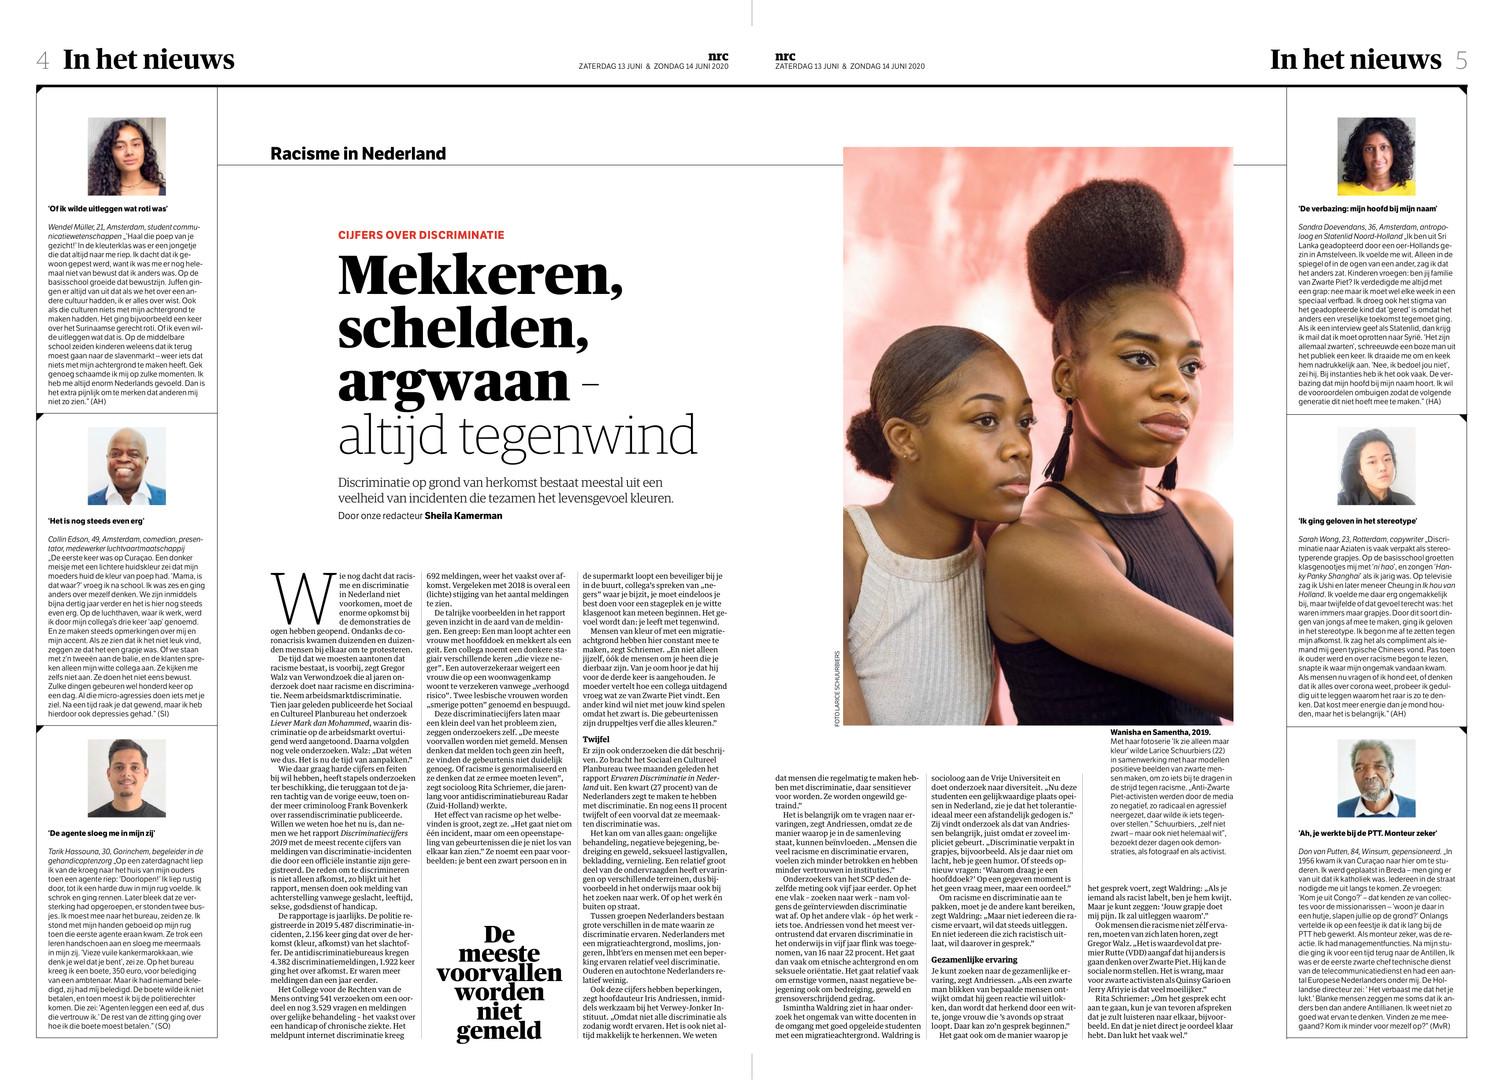 nrc-handelsblad-20200613-104.jpg